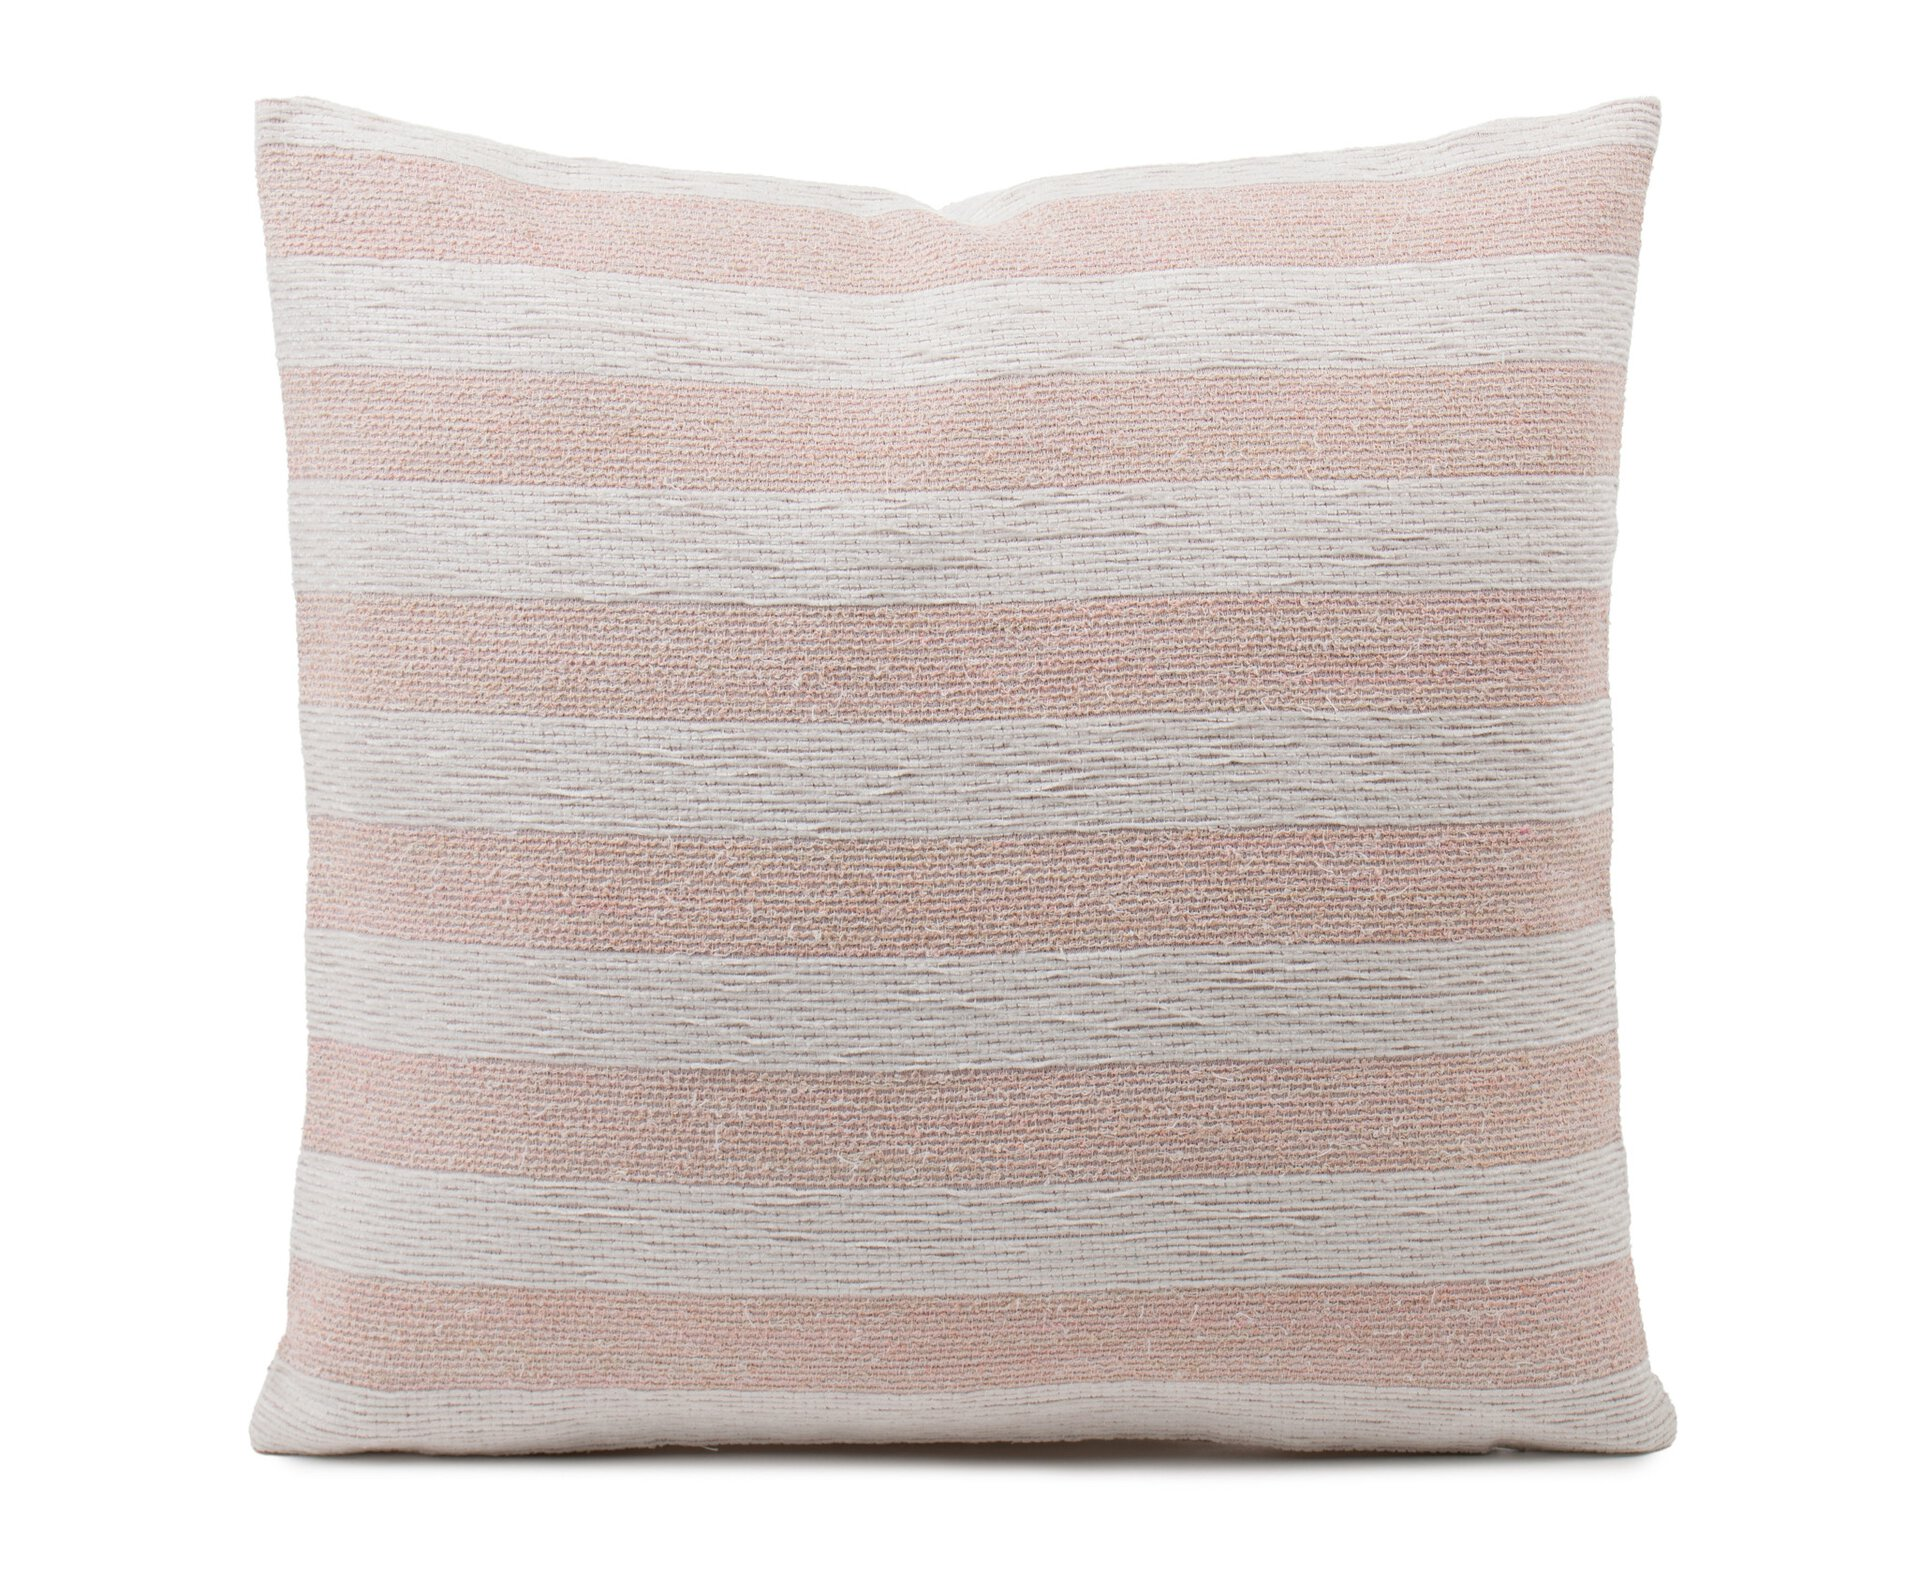 Kissenhülle Bormio Ambiente Trendlife Textil rosa 50 x 50 cm